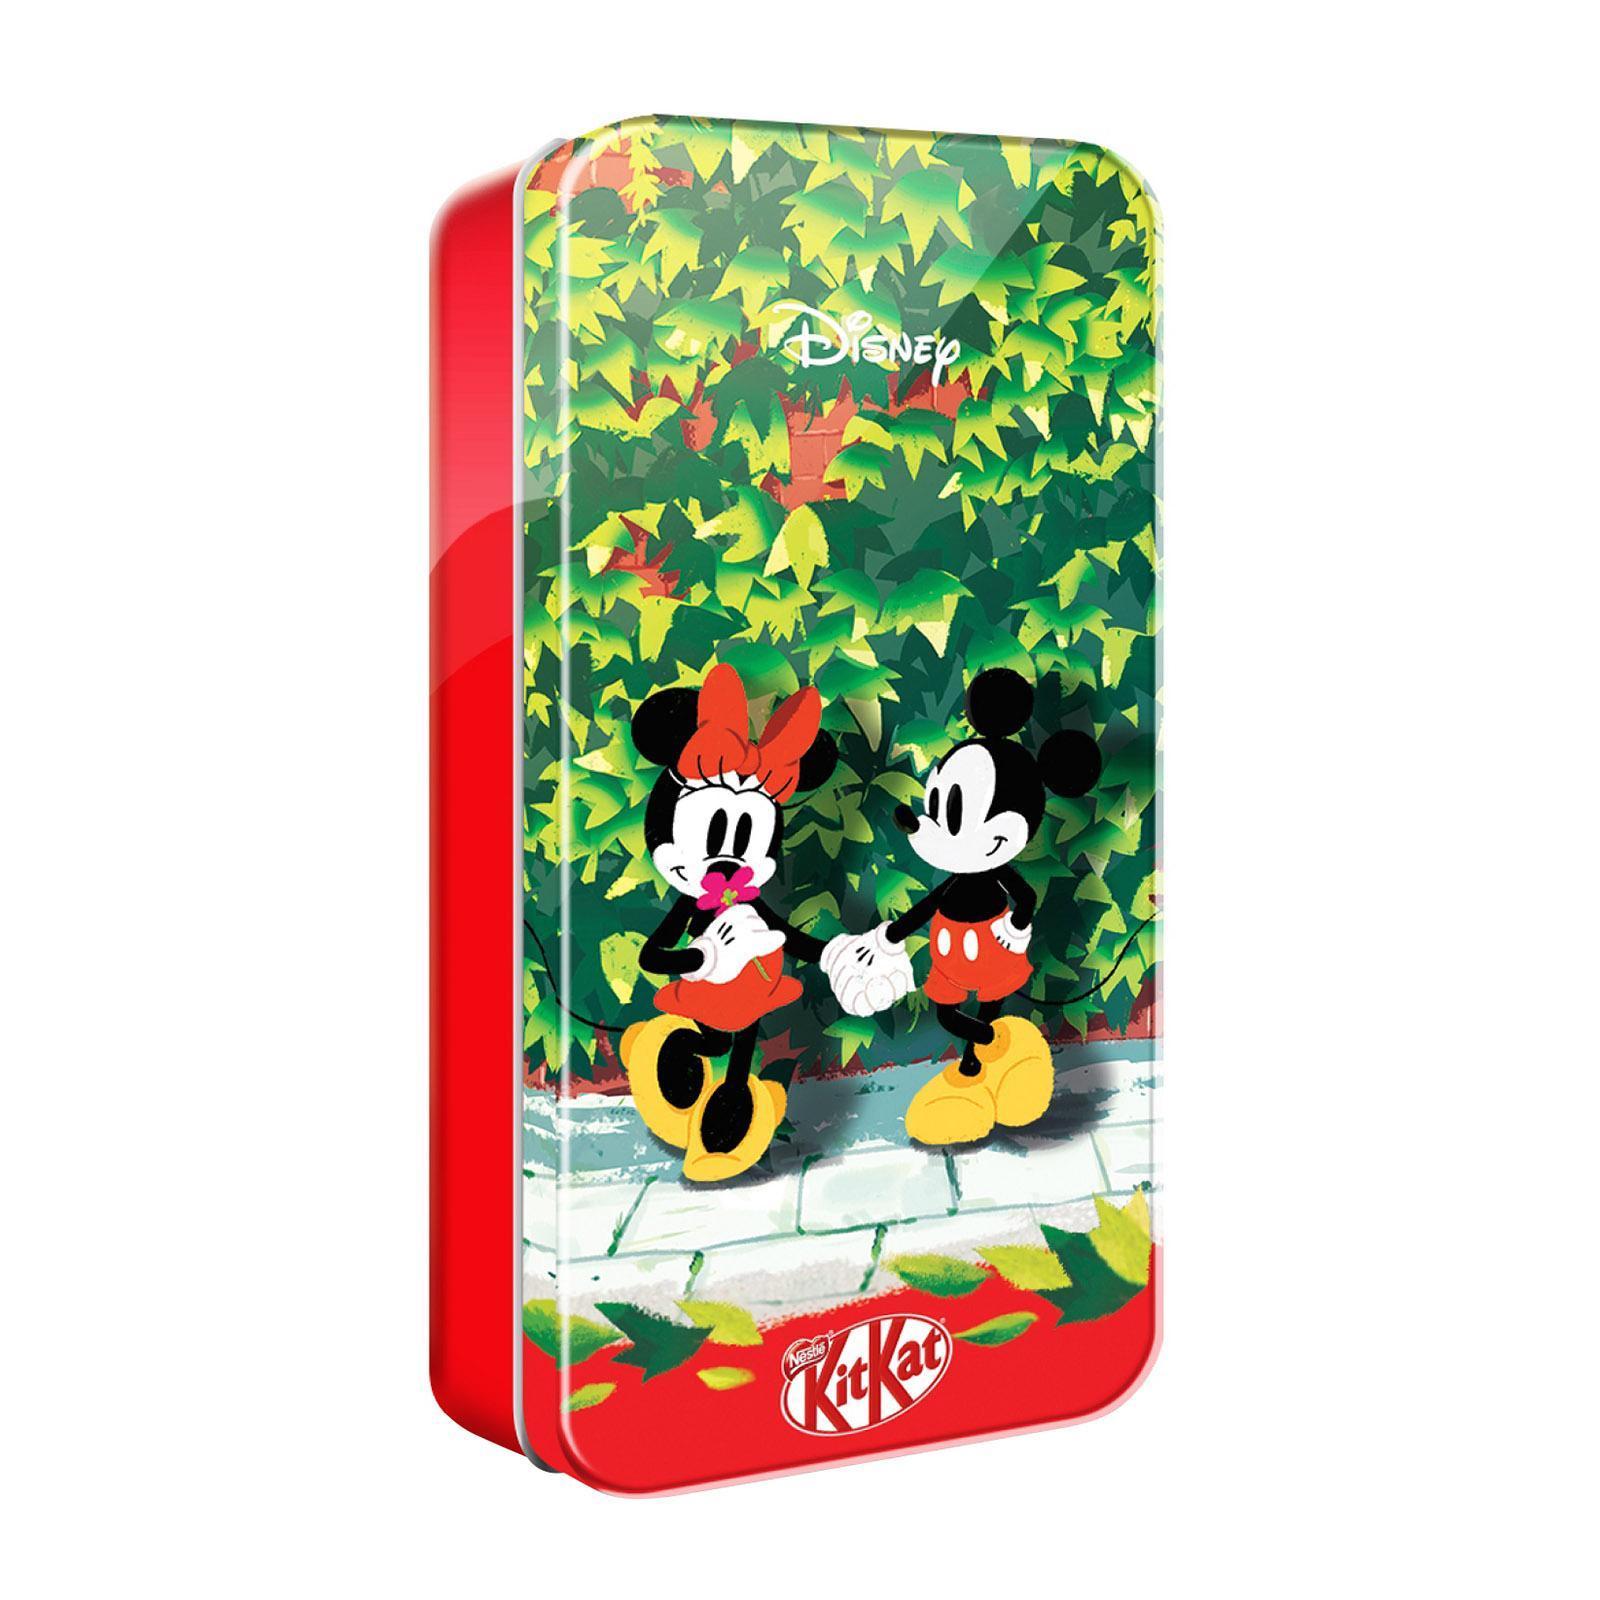 Nestle Kit Kat X Disney Magical Seasons Pencil Tin (Packed with KIT KAT MINI Cookies and Cream 6s and KIT KAT Bites )